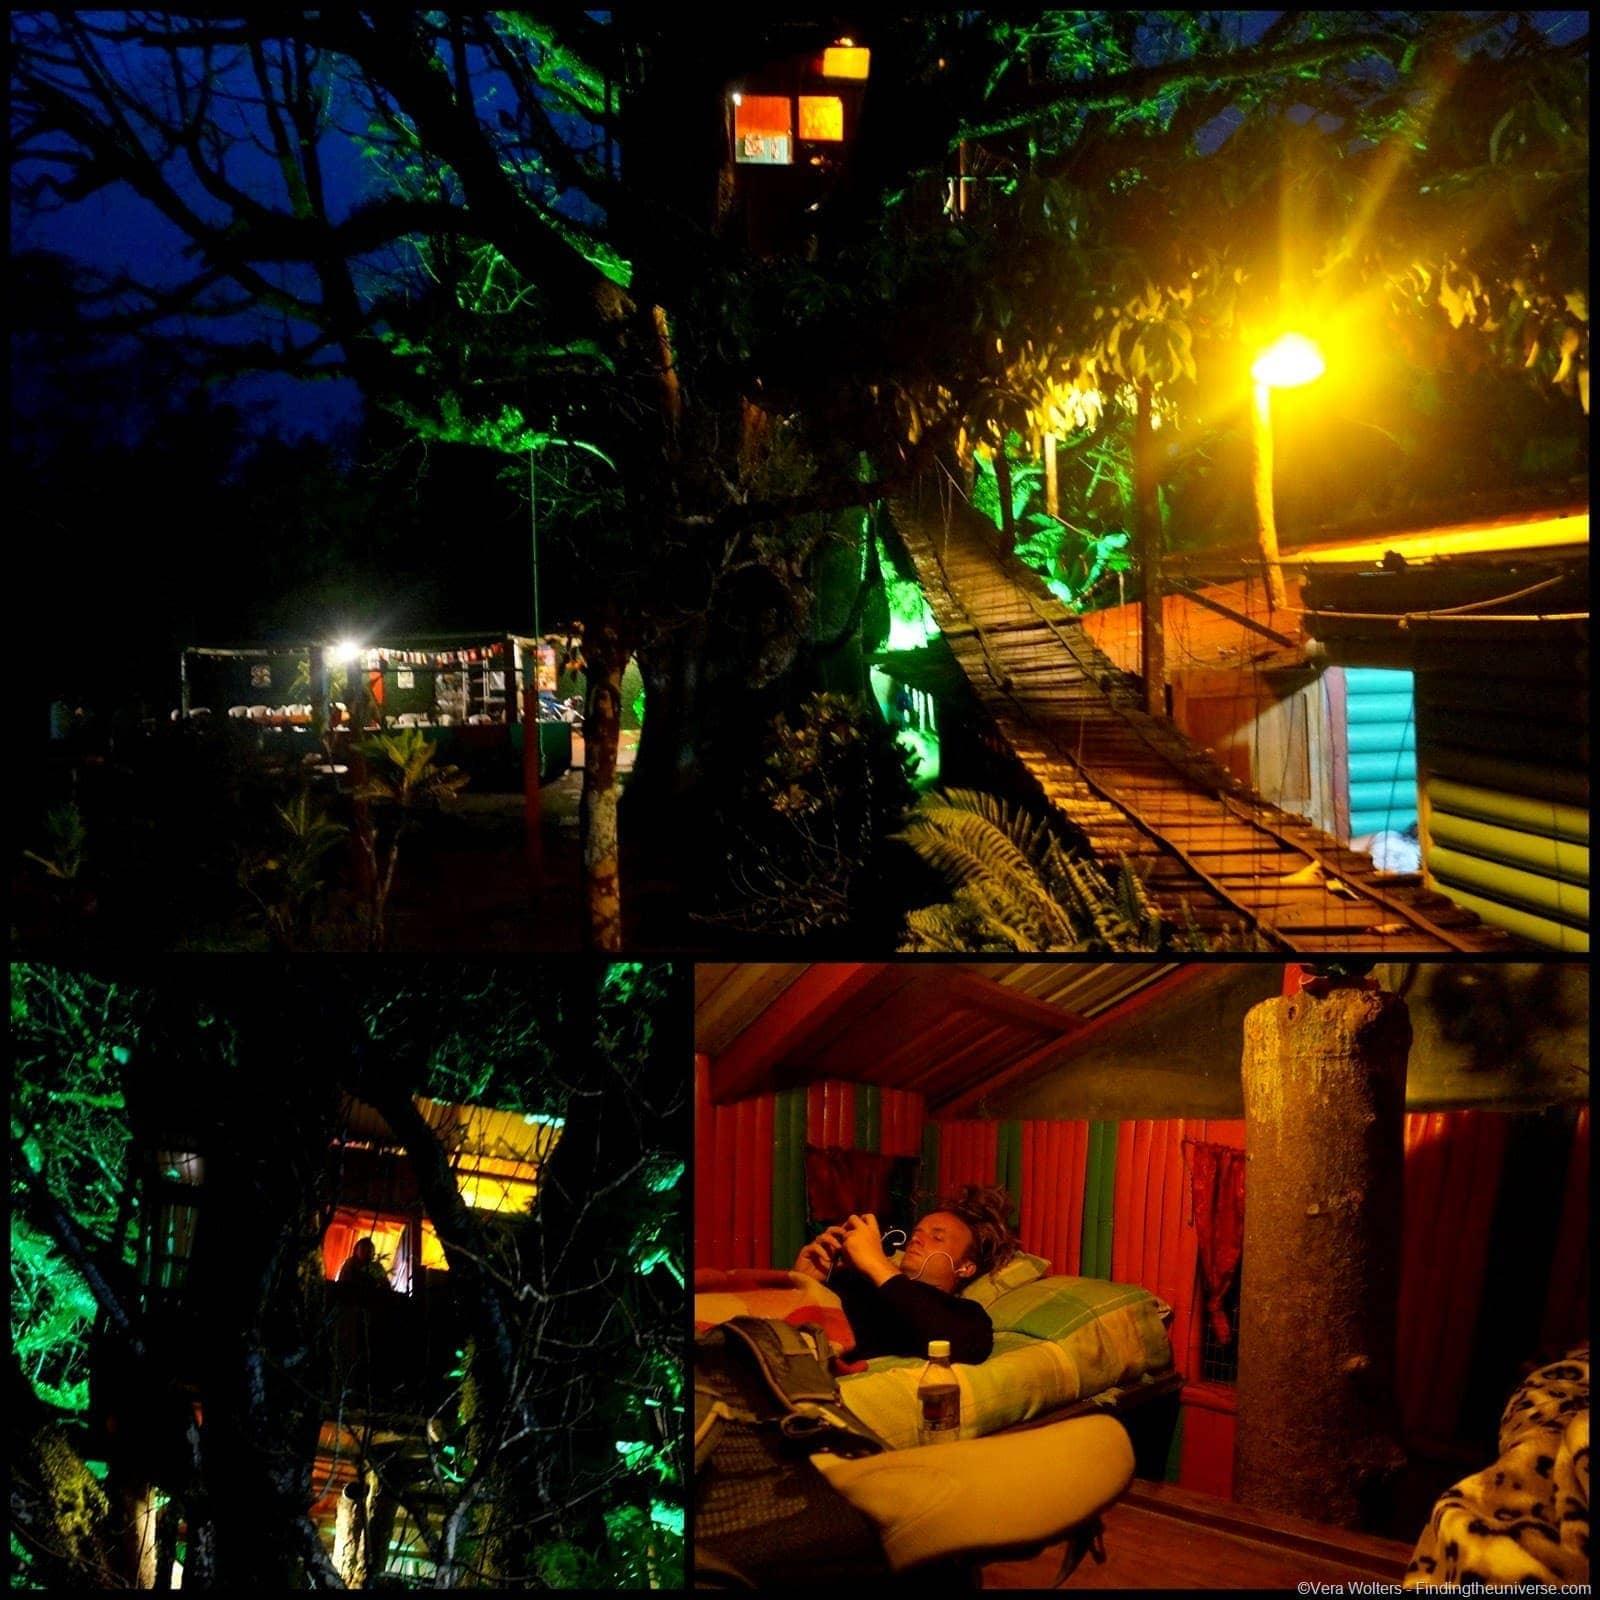 Tree House Sleepover - El Ceibo, San Cristobal, Galapagos